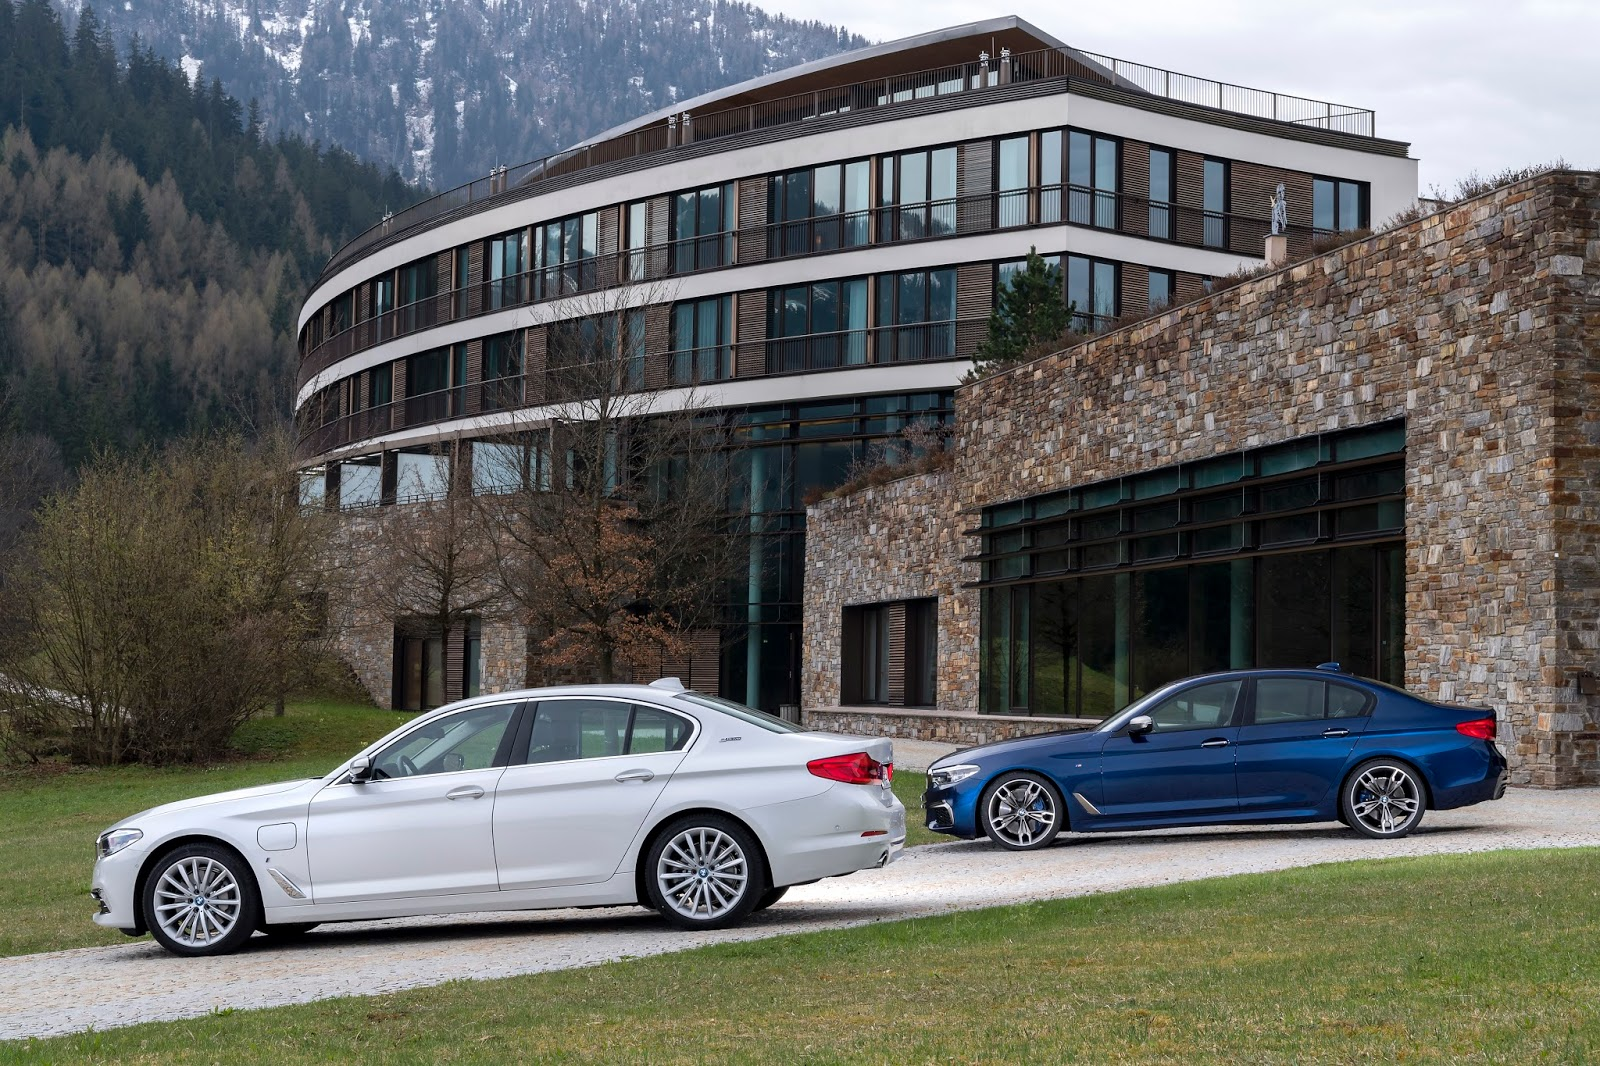 P90255022 highRes family shot bmw 530e 1 Η BMW 530e iPerformance φέρνει την ηλεκτρική επανάσταση BMW, BMW 5, BMW 530e iPerformance, Electric cars, Hybrid, Λανσάρισμα